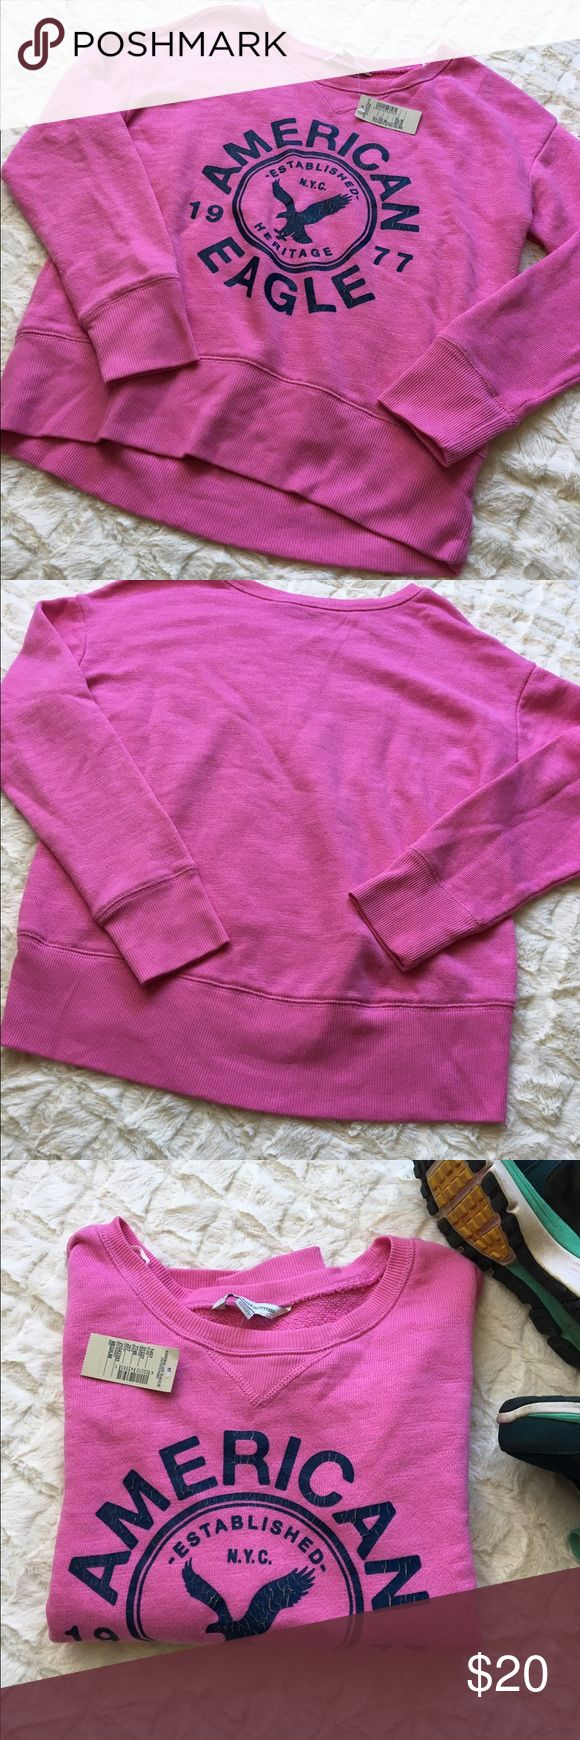 NWT American Eagle Sweatshirt. NWT American Eagle Sweatshirt. Pink with blue graphic. Size medium. American Eagle Outfitters Tops Sweatshirts & Hoodies